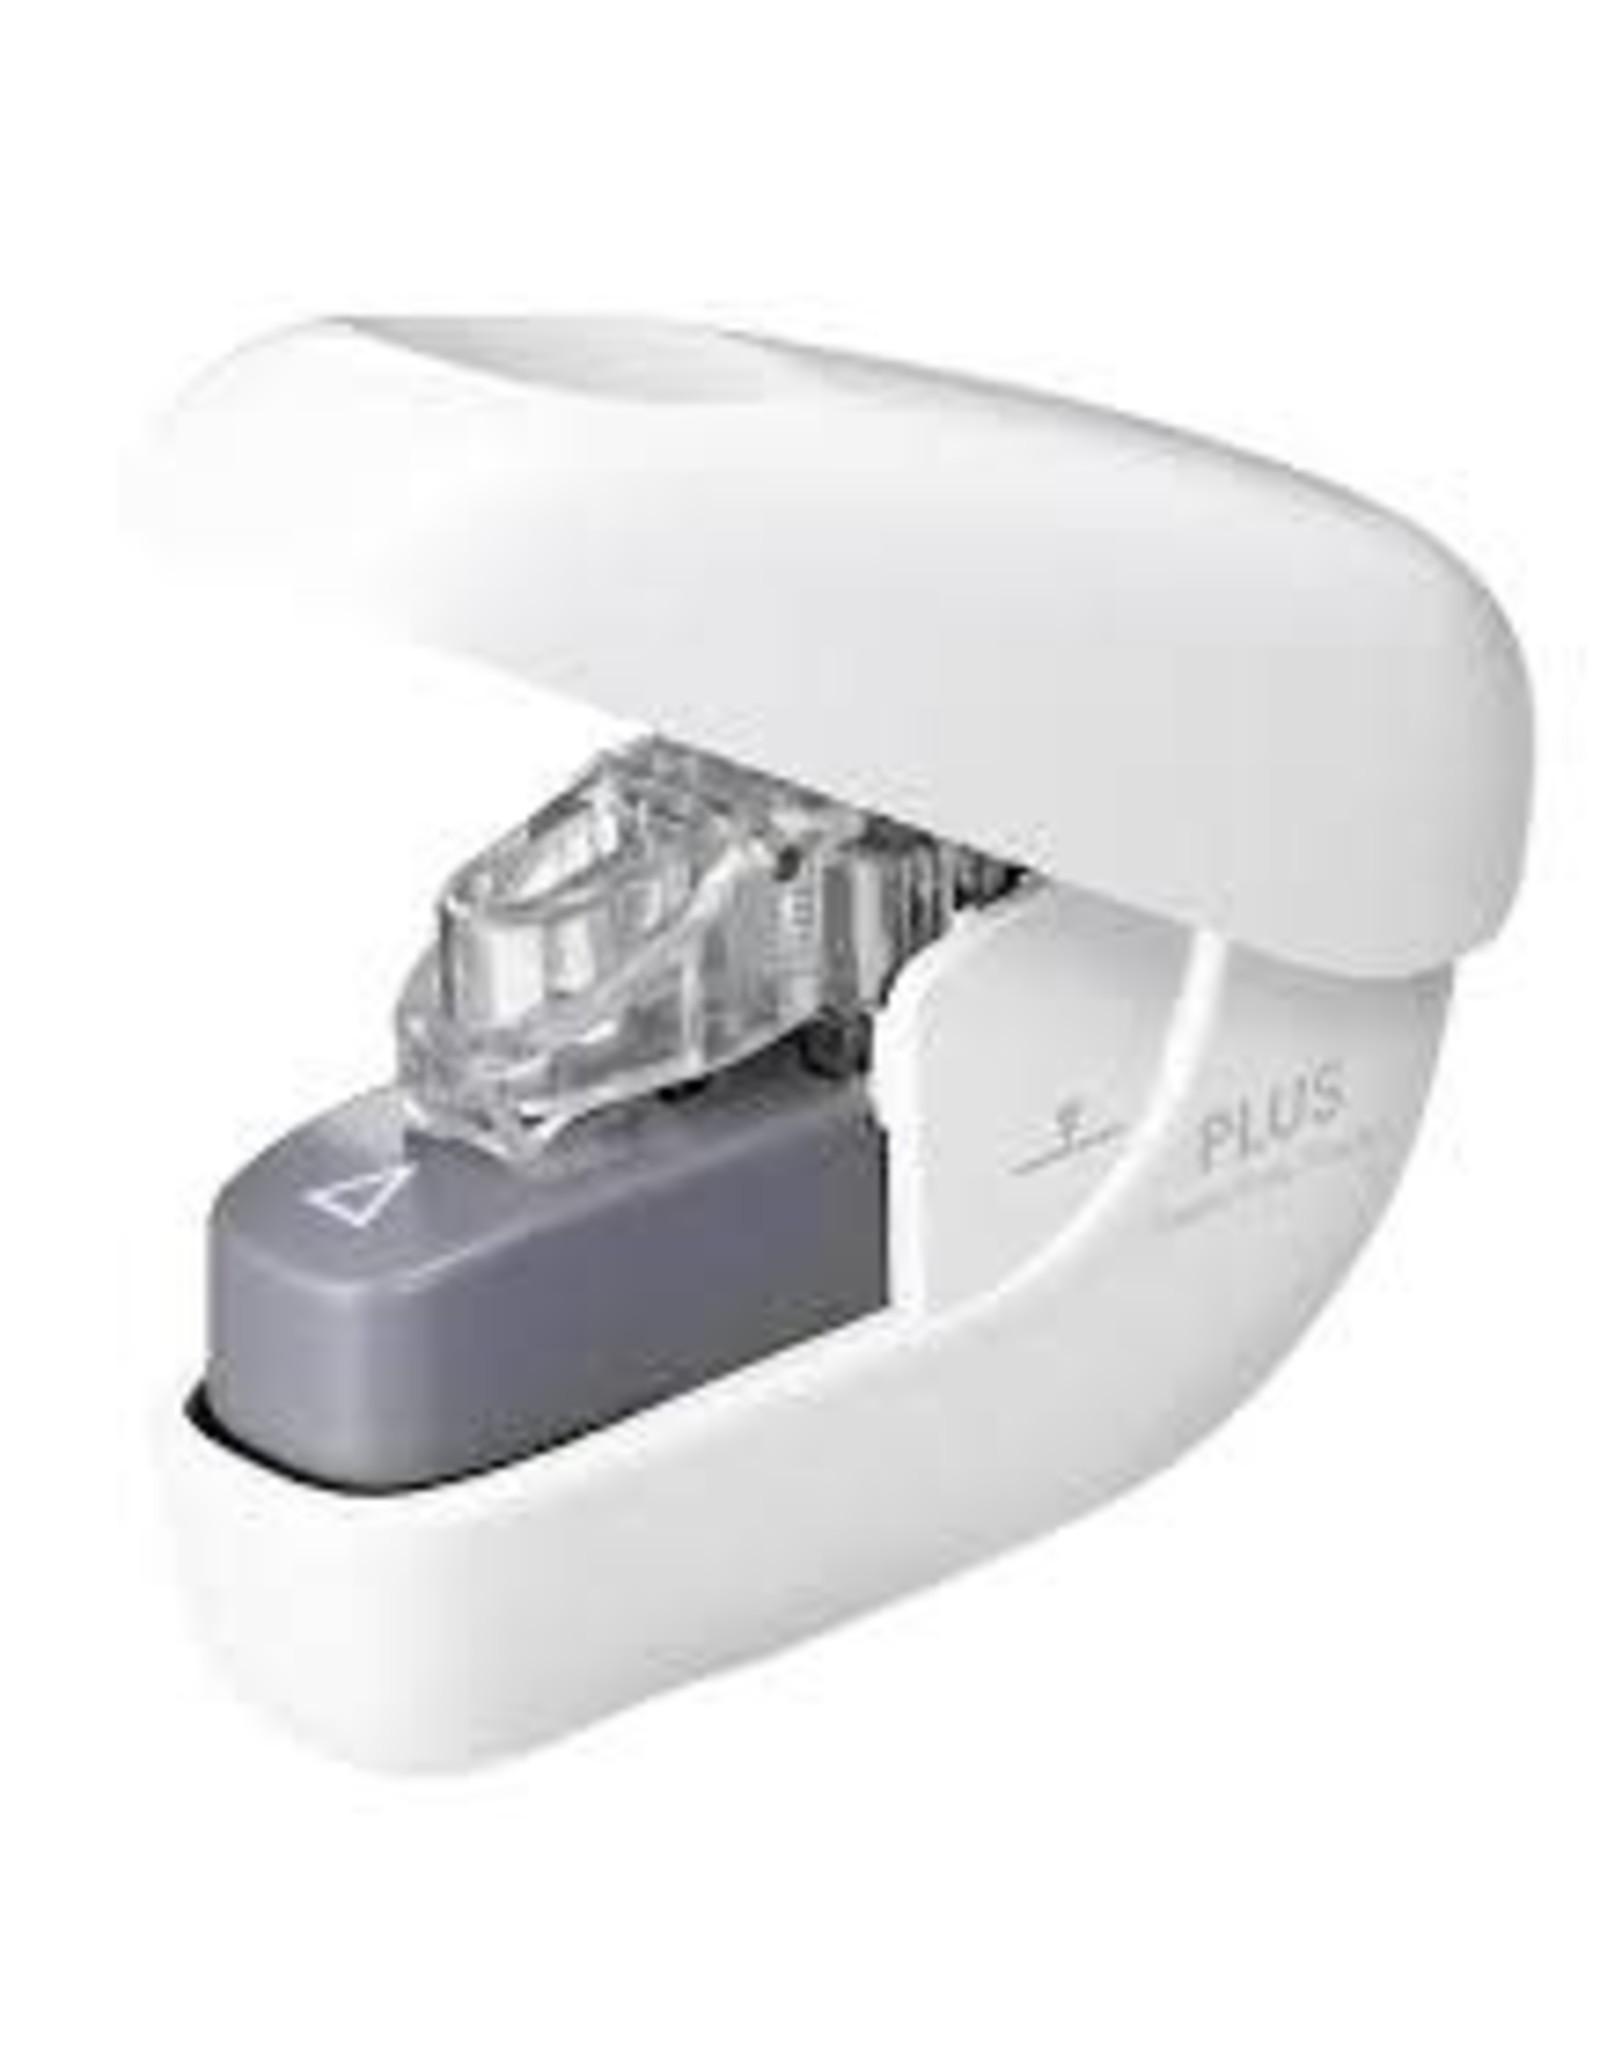 PLUS CORPORATION PAPER CLINCH 6 WHITE